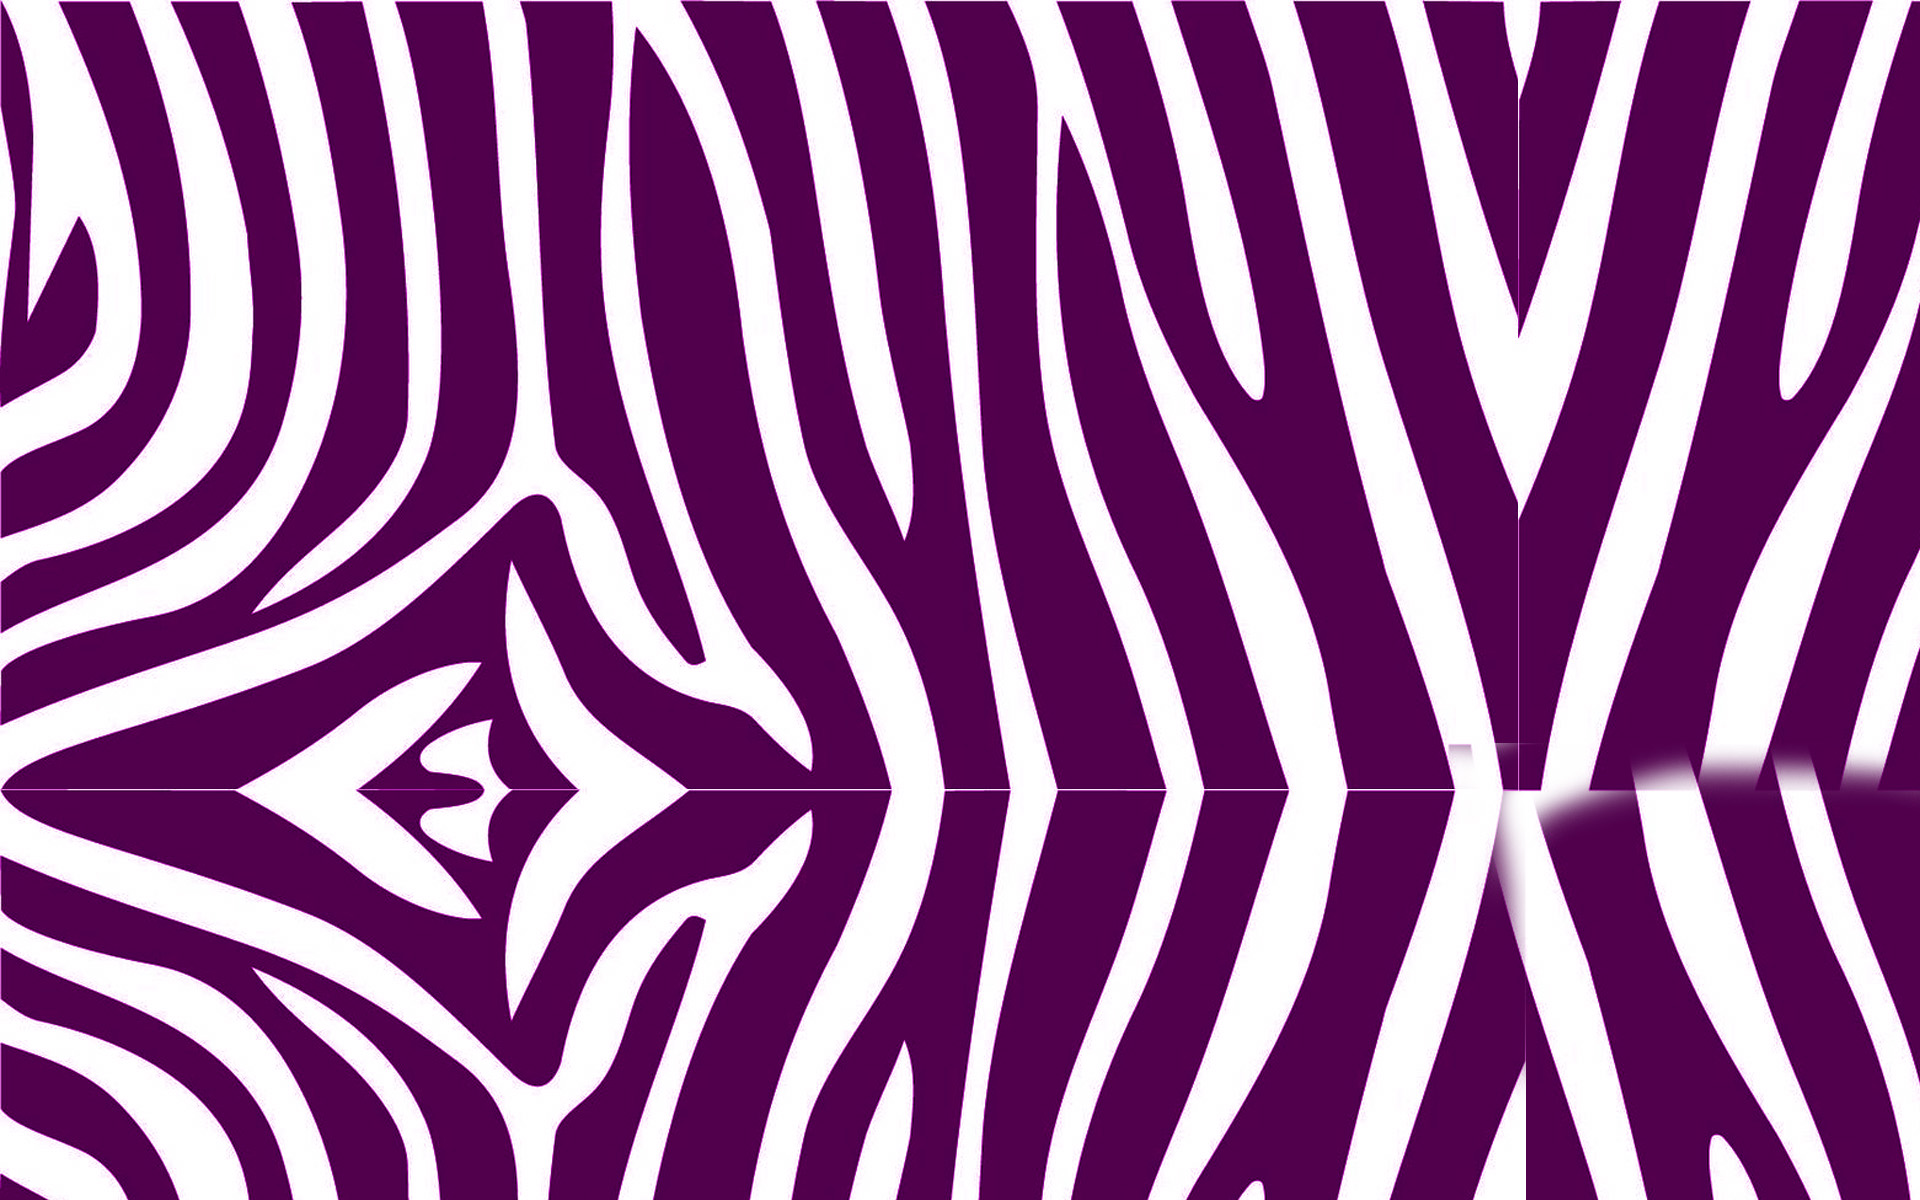 Zebra Print Wallpaper 3D Abstract HD Wallpapers 1920x1200